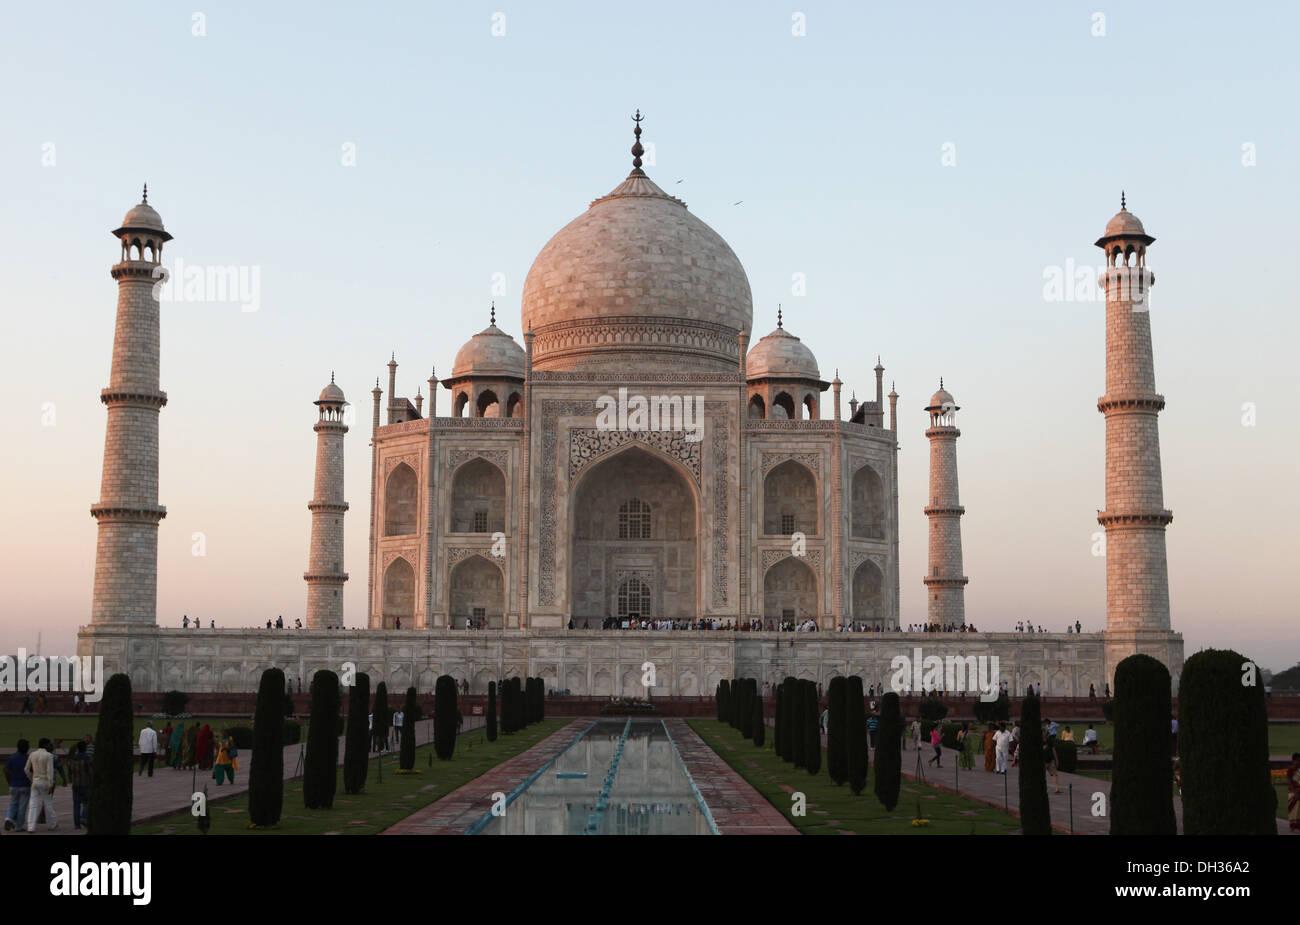 Taj Mahal bei Sonnenuntergang, Agra, Uttar Pradesh, Indien, Asien Stockbild